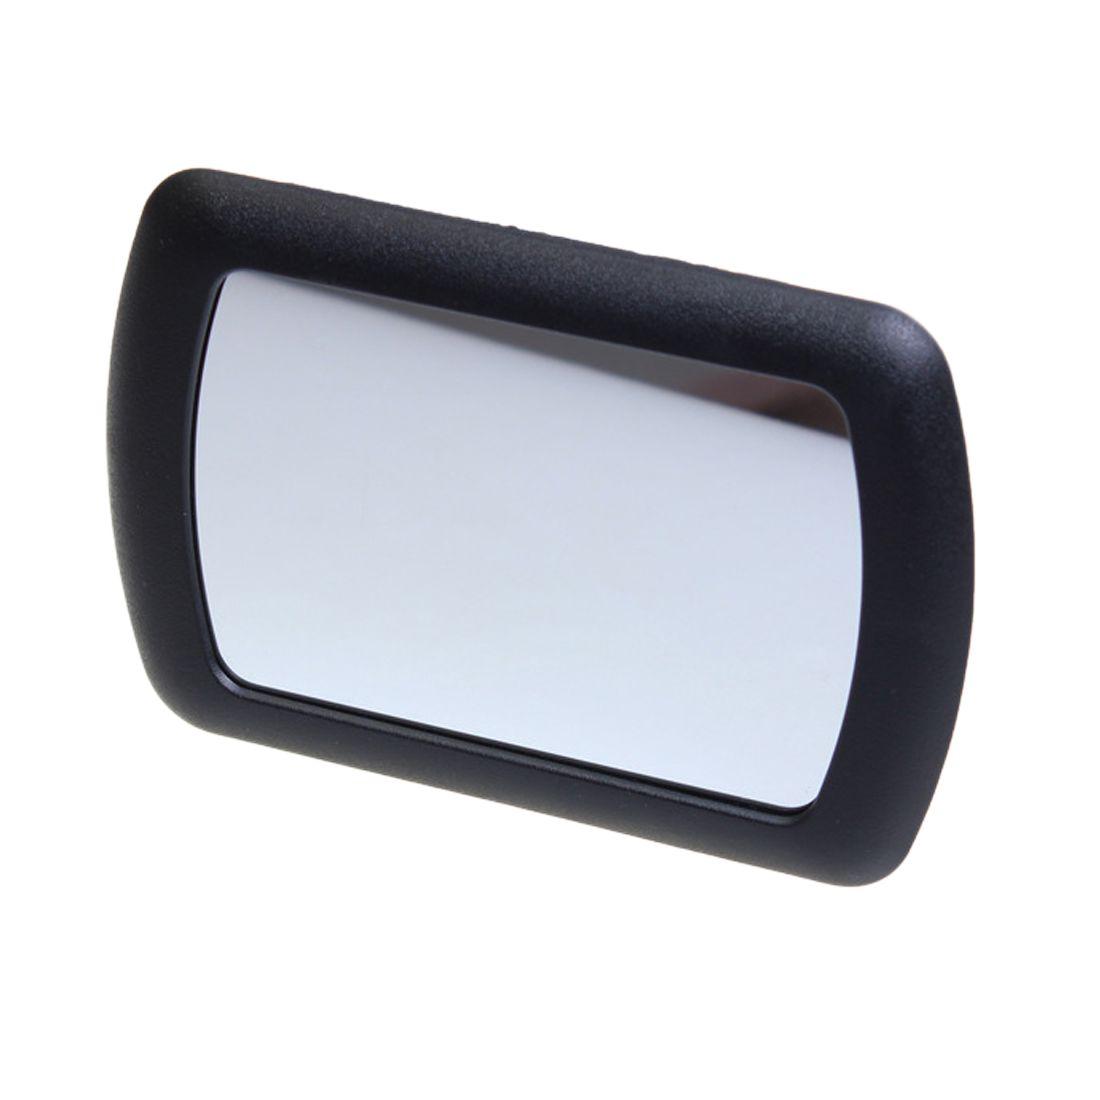 Hot Salesun Visor Mirror Large Car Makeup Sun Shading Mirror Car Cosmetic Mirror Vanity Mirror Auto Supplies Car Mirror Cosmetic Mirror Vanity Mirror